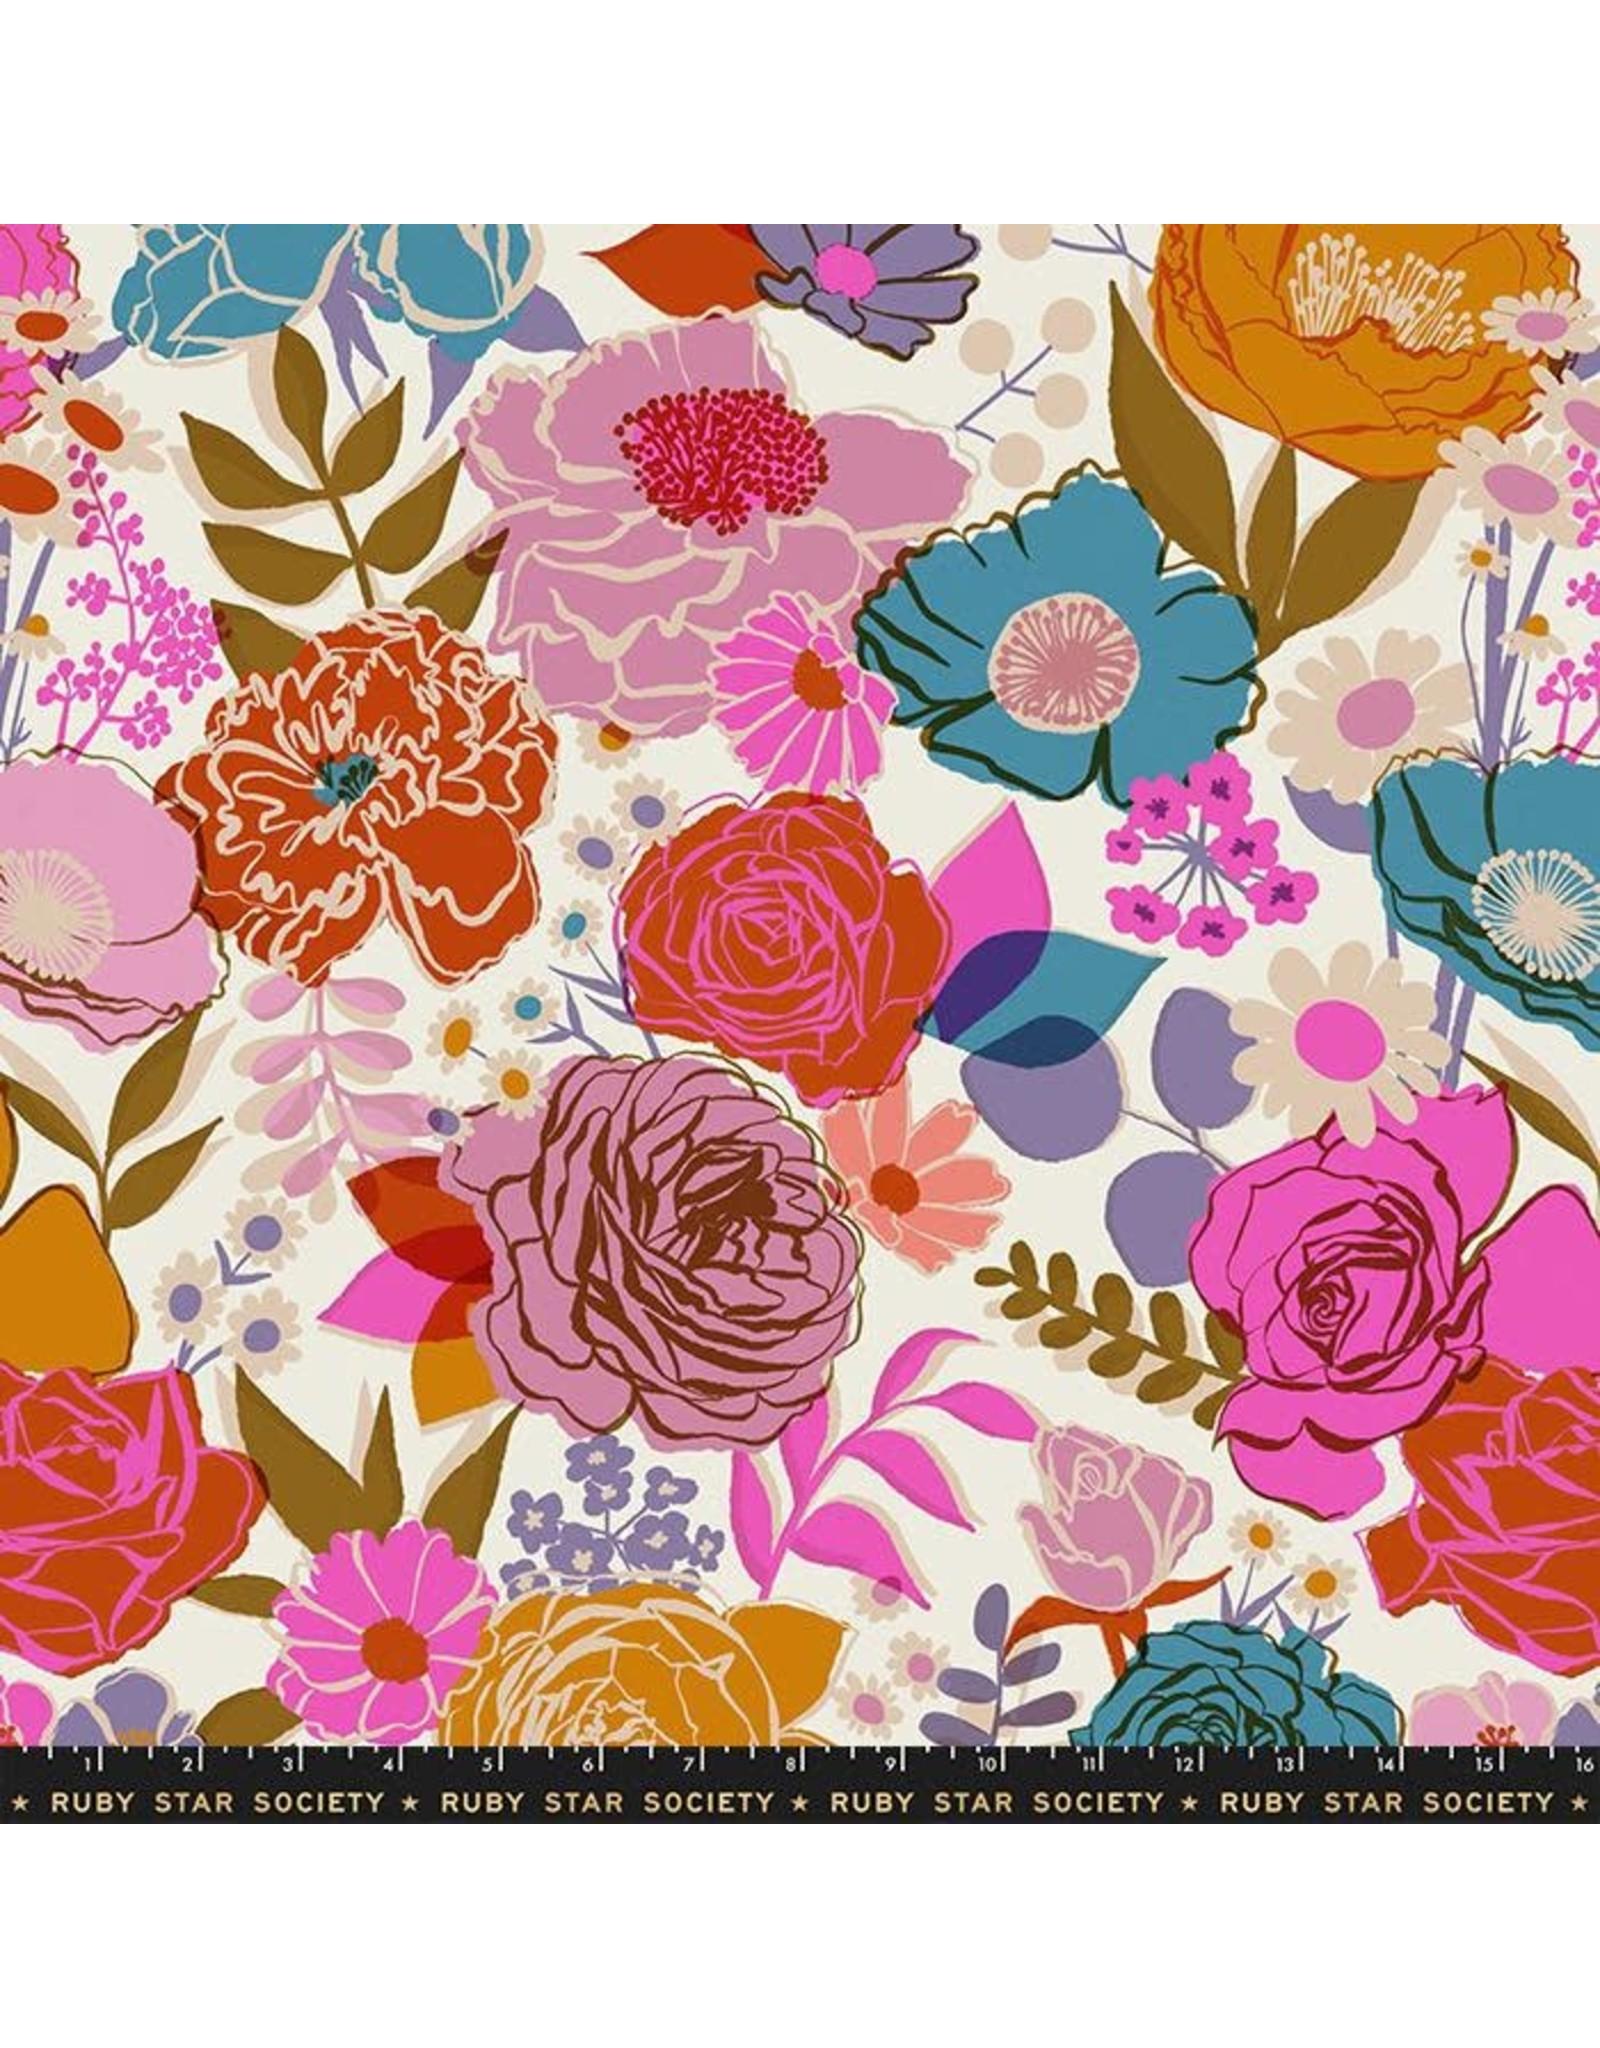 Ruby Star Society for Moda Ruby Star Society, Rise, Wideback in Shell, Fabric Half-Yards RS111165 11